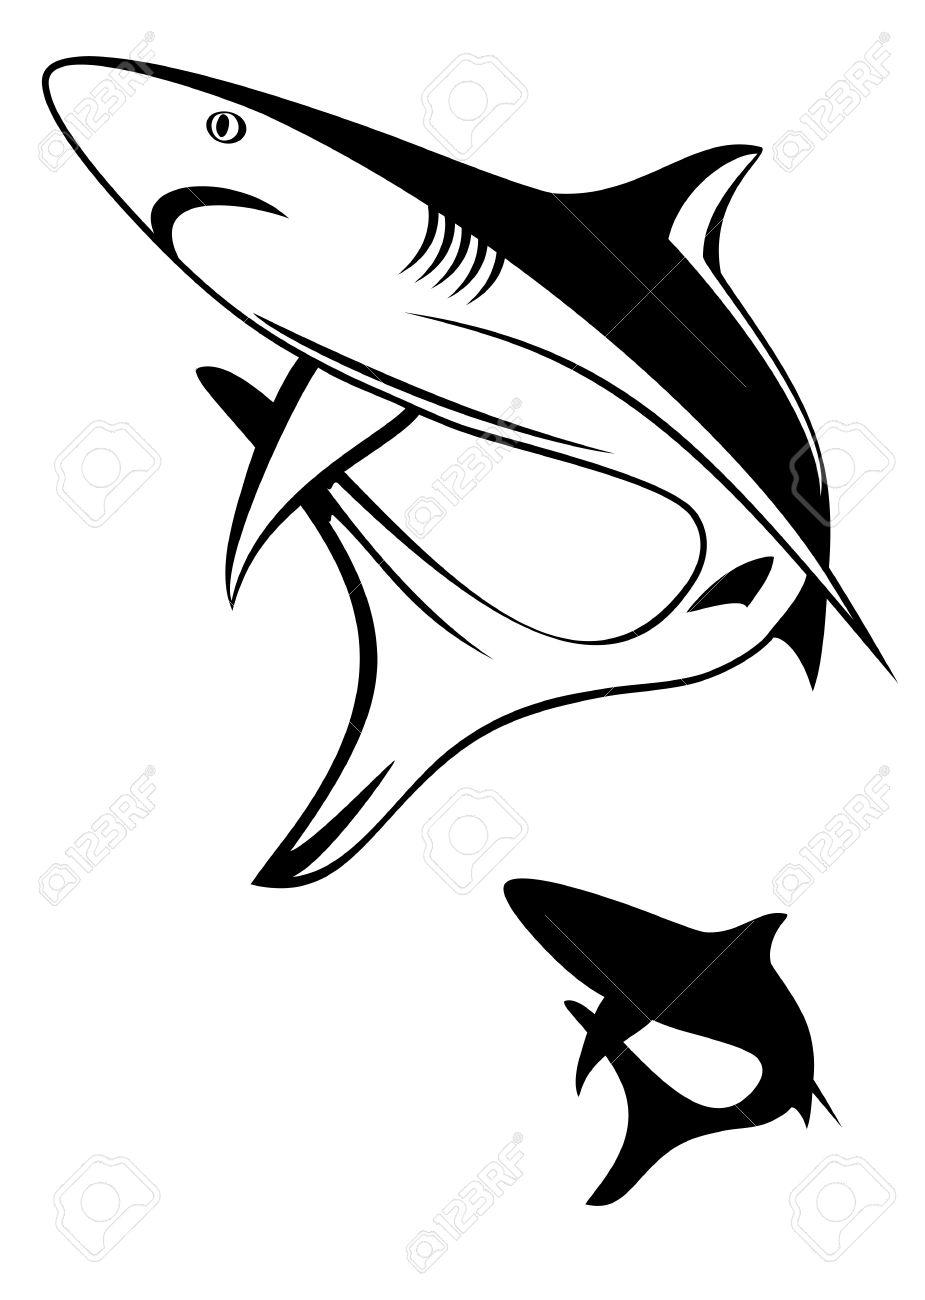 Vector illustration black shark and silhouette Stock Vector - 12963375